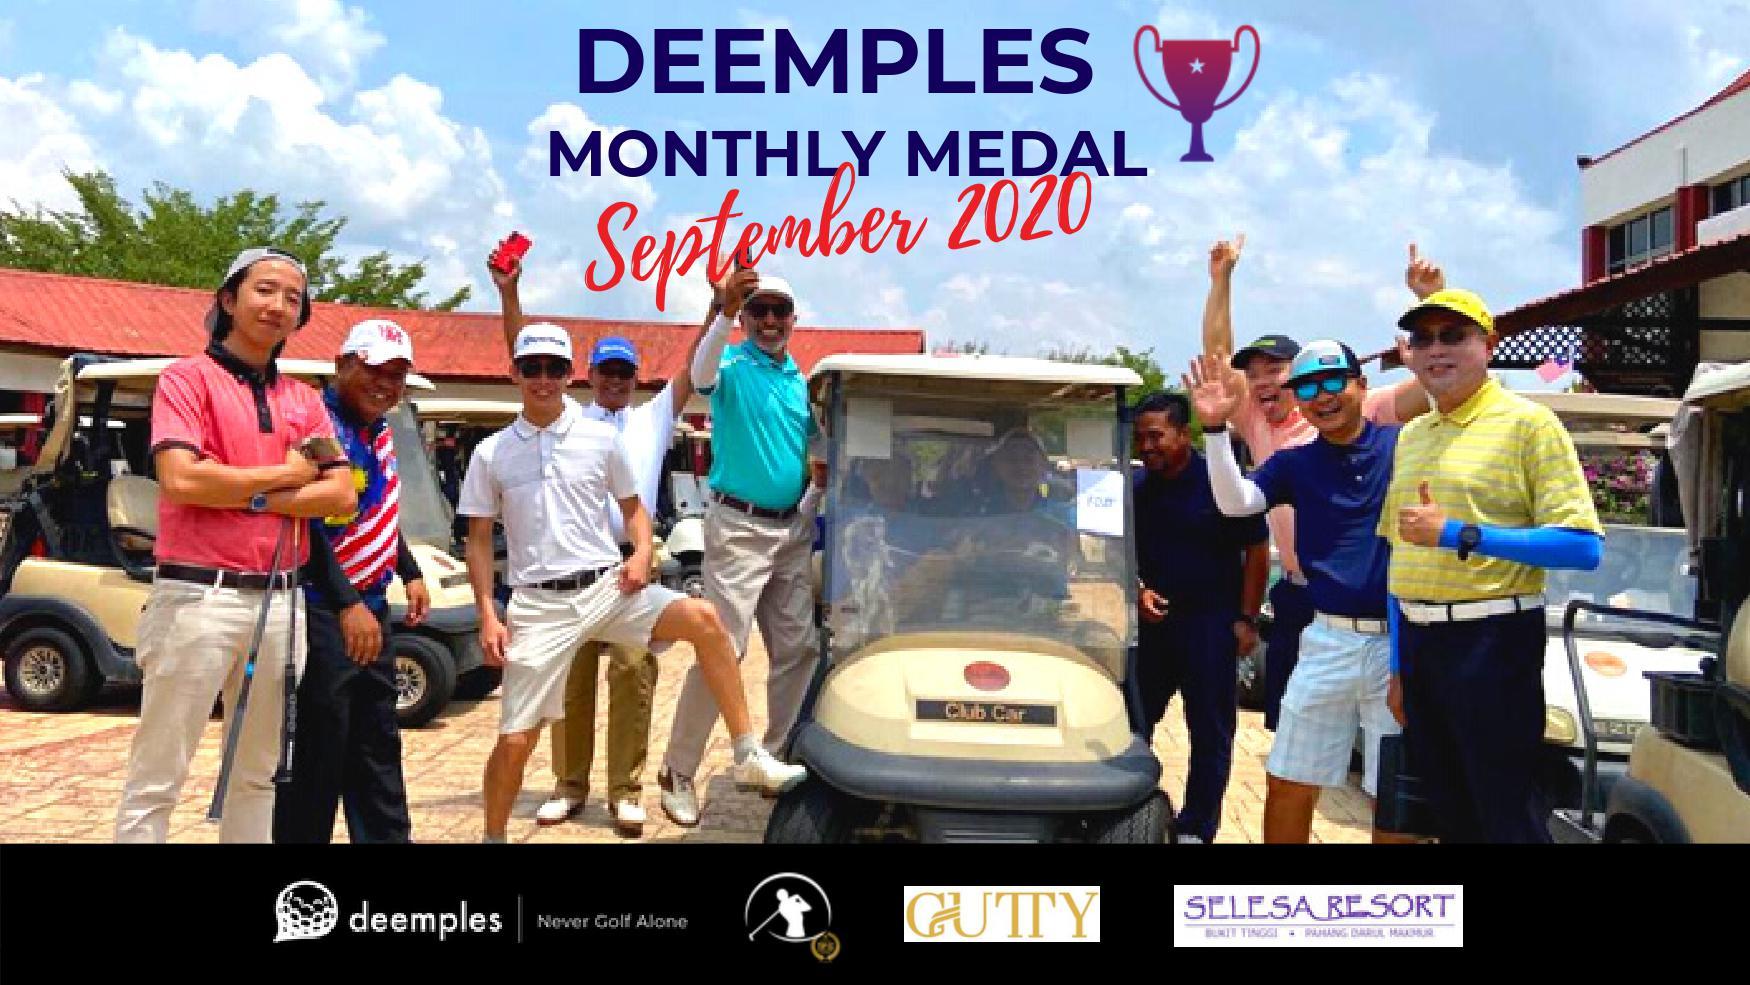 deemples-monthly-medal-september